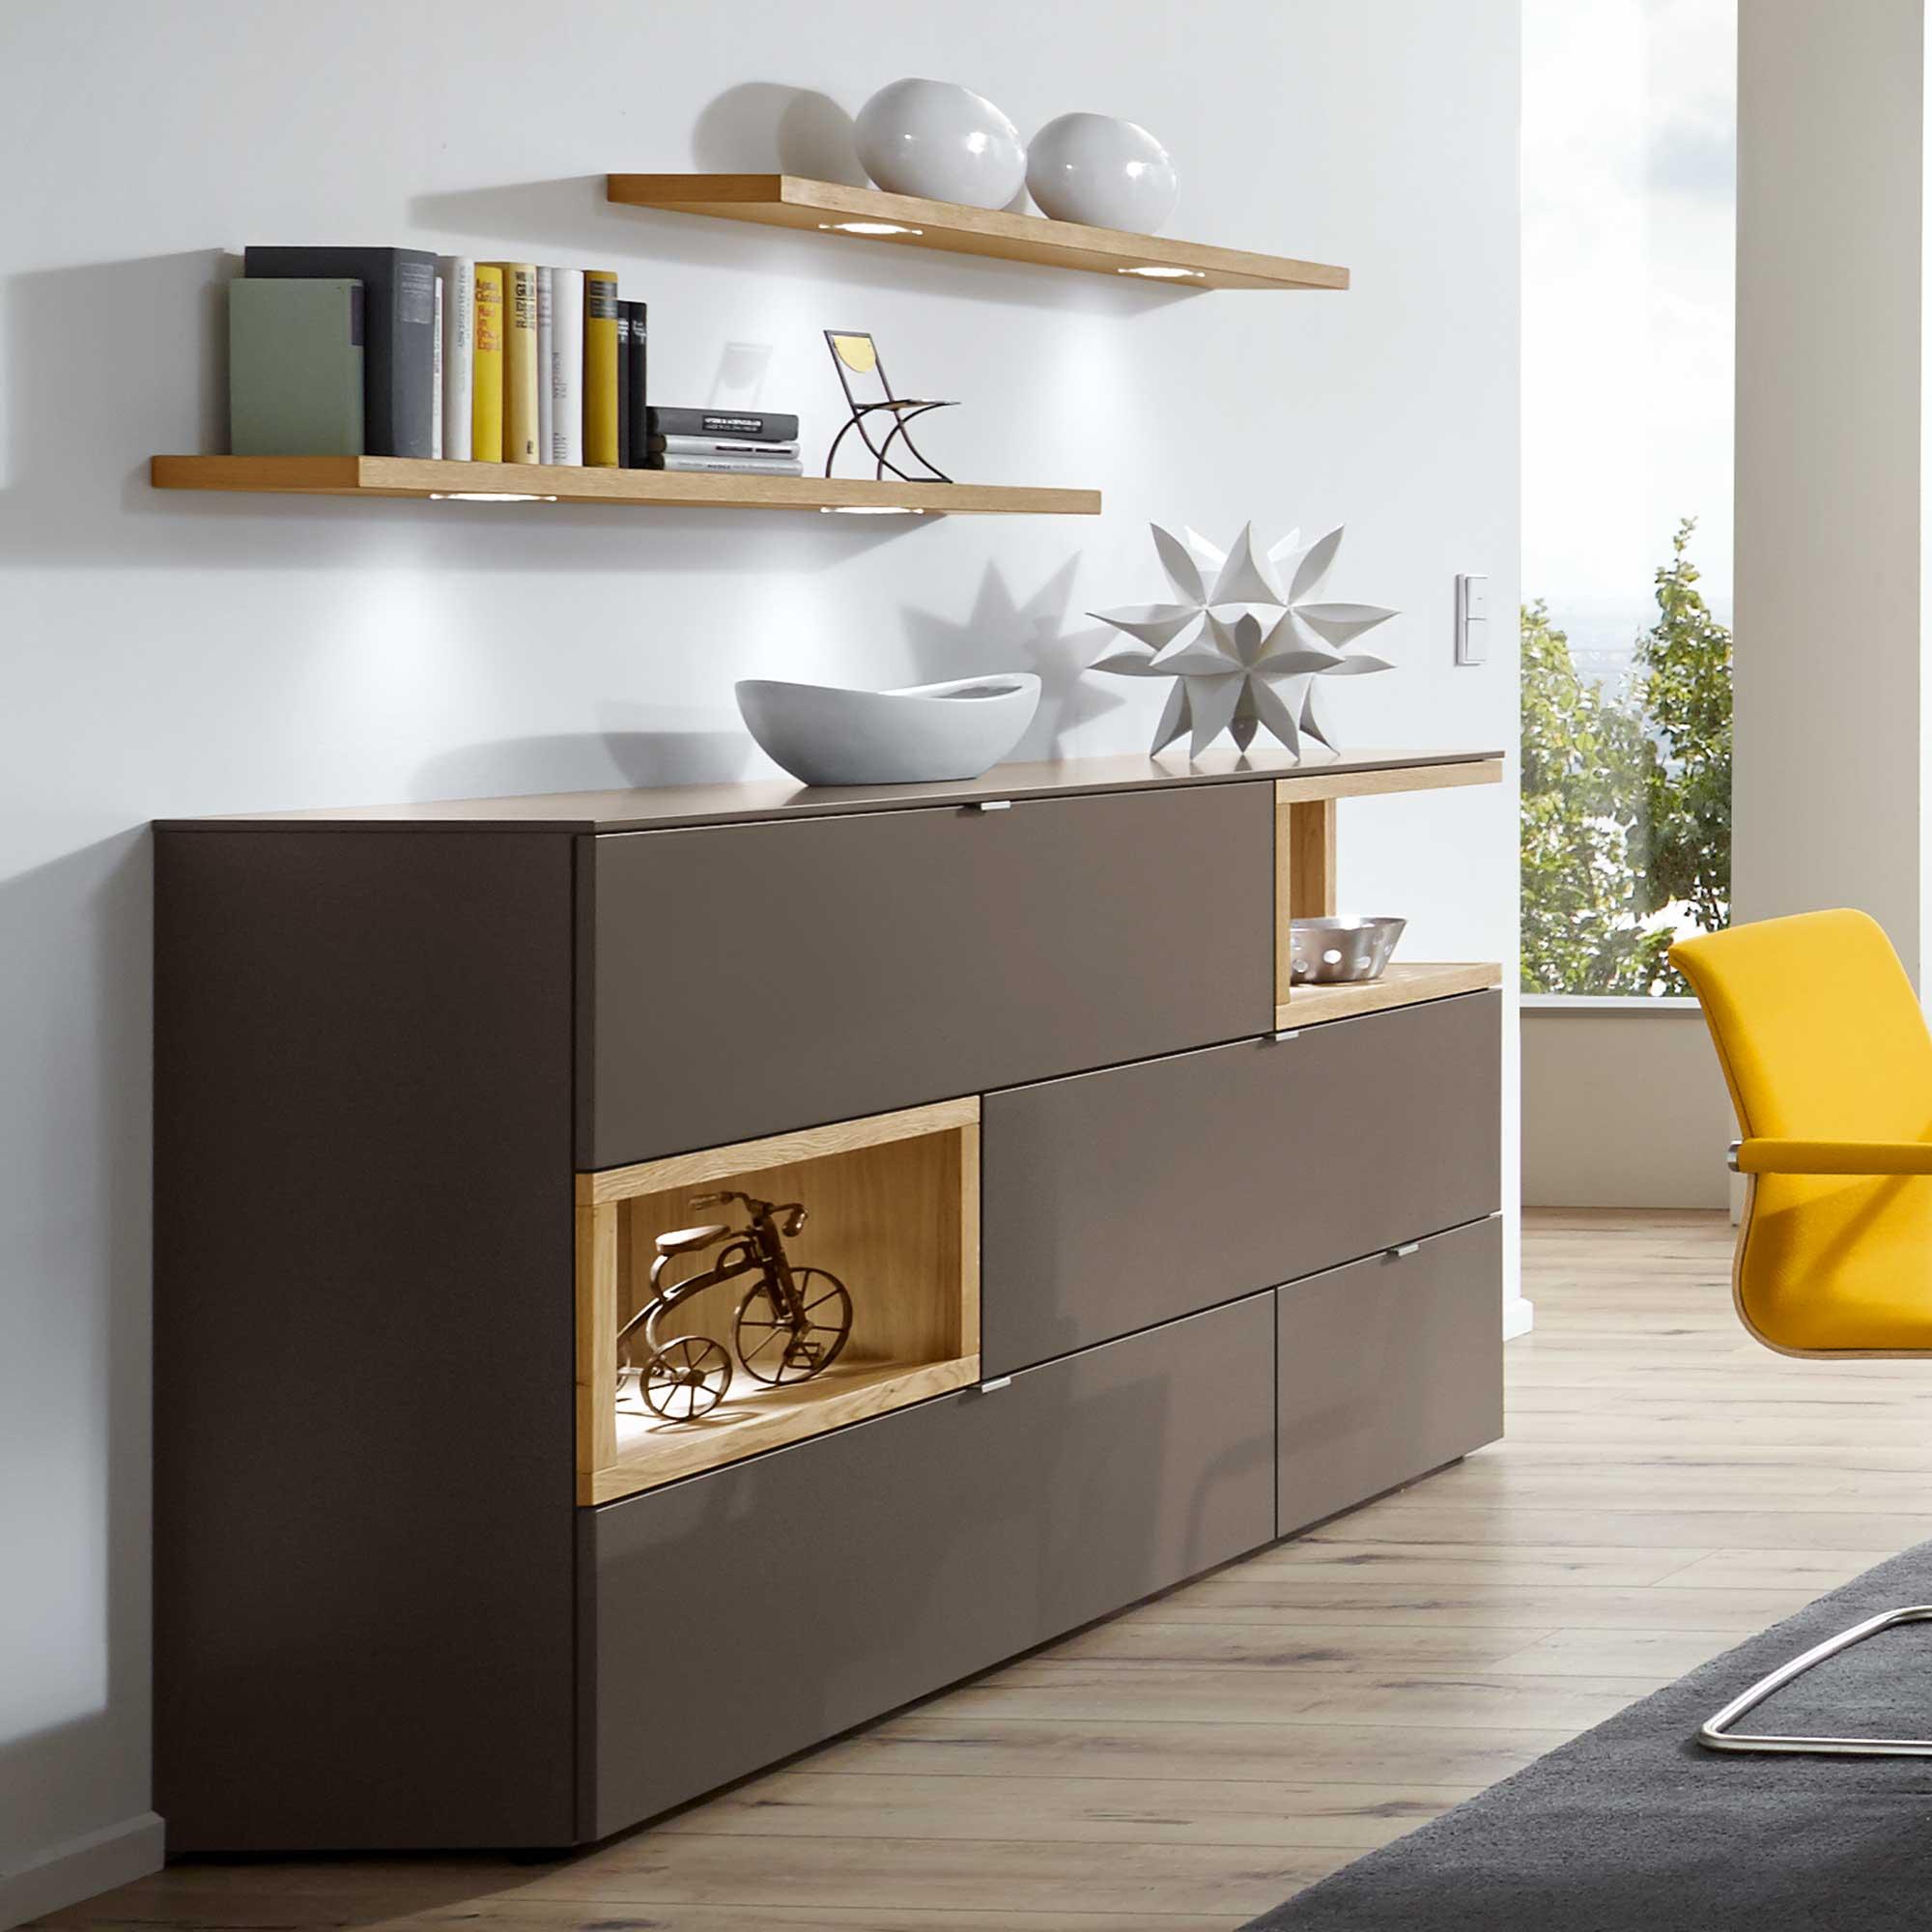 wohnkombi andiamo von venjakob in grau m bel b r ag. Black Bedroom Furniture Sets. Home Design Ideas